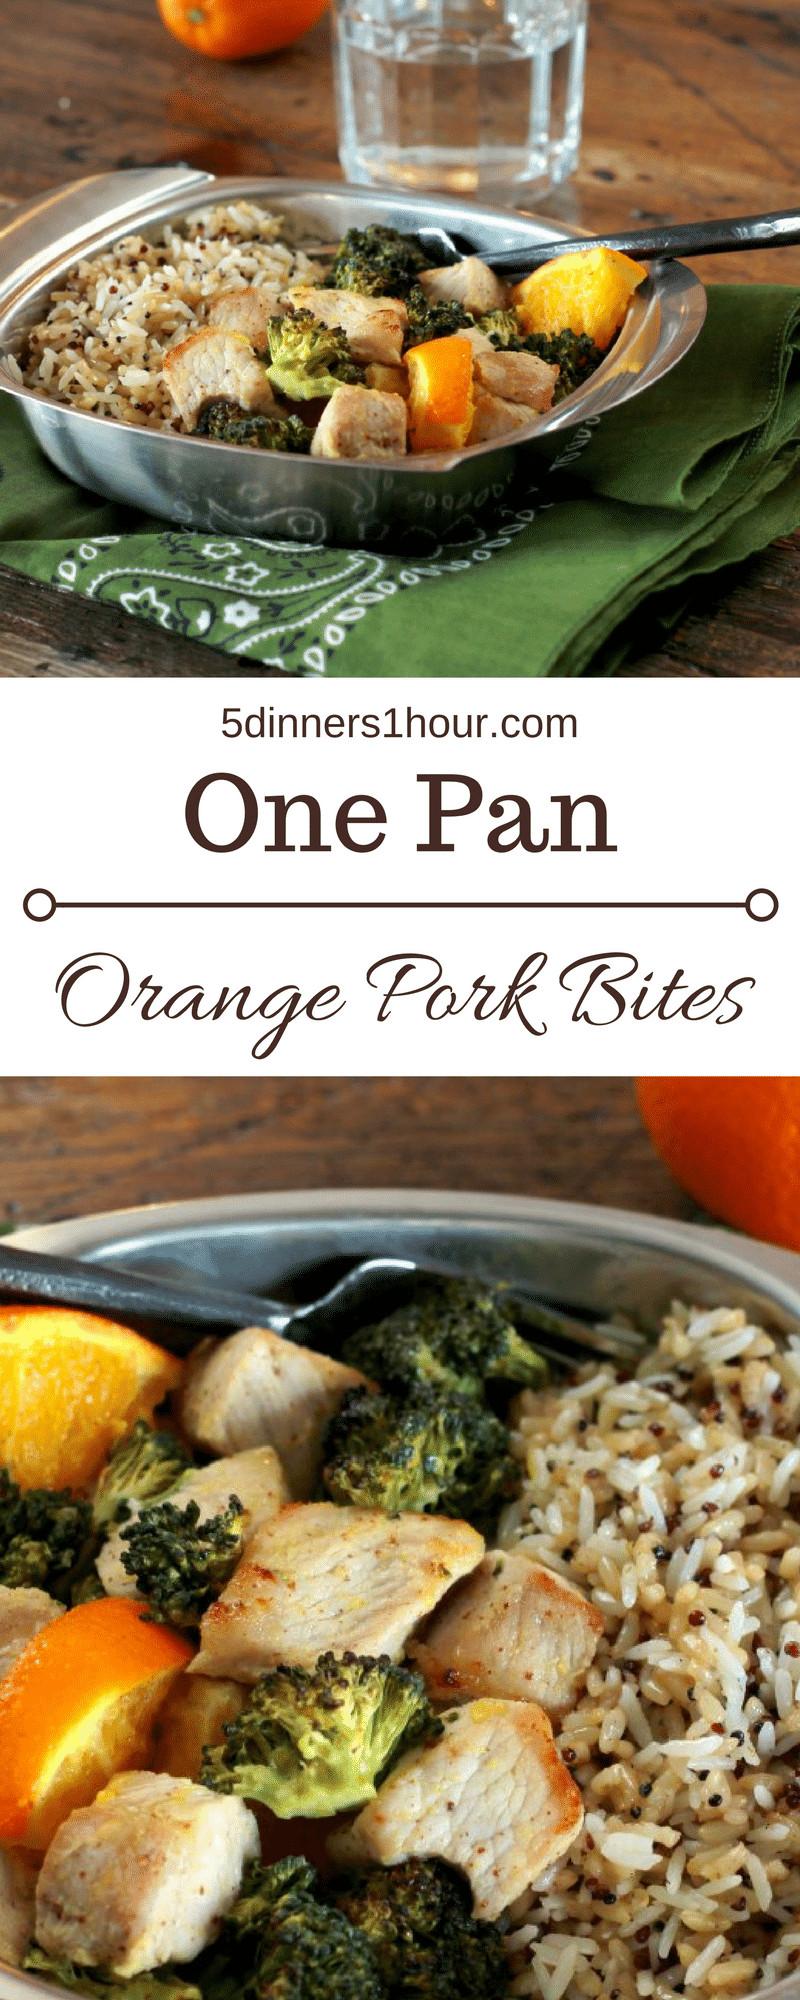 5 Dinners In 1 Hour  e Pan Orange Pork Bites 5 Dinners In 1 Hour